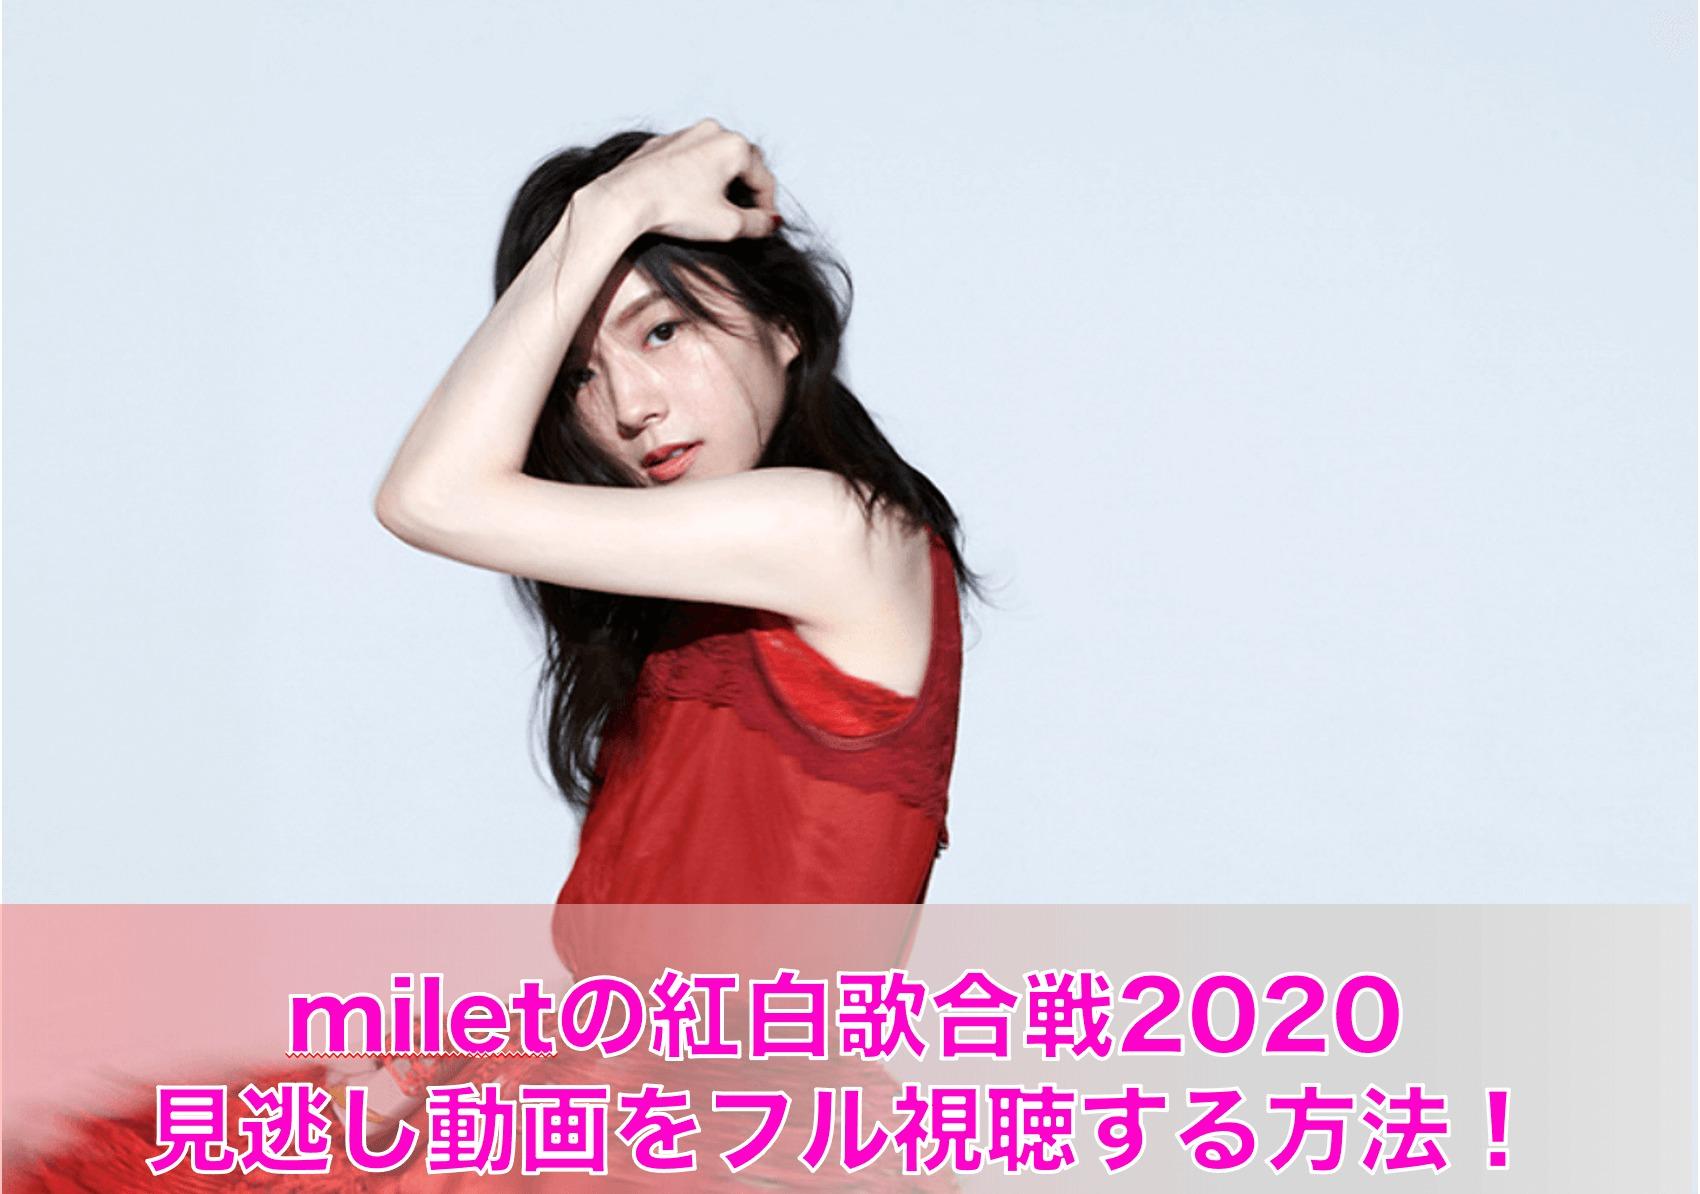 miletの紅白歌合戦2020見逃し動画をフル視聴する方法!